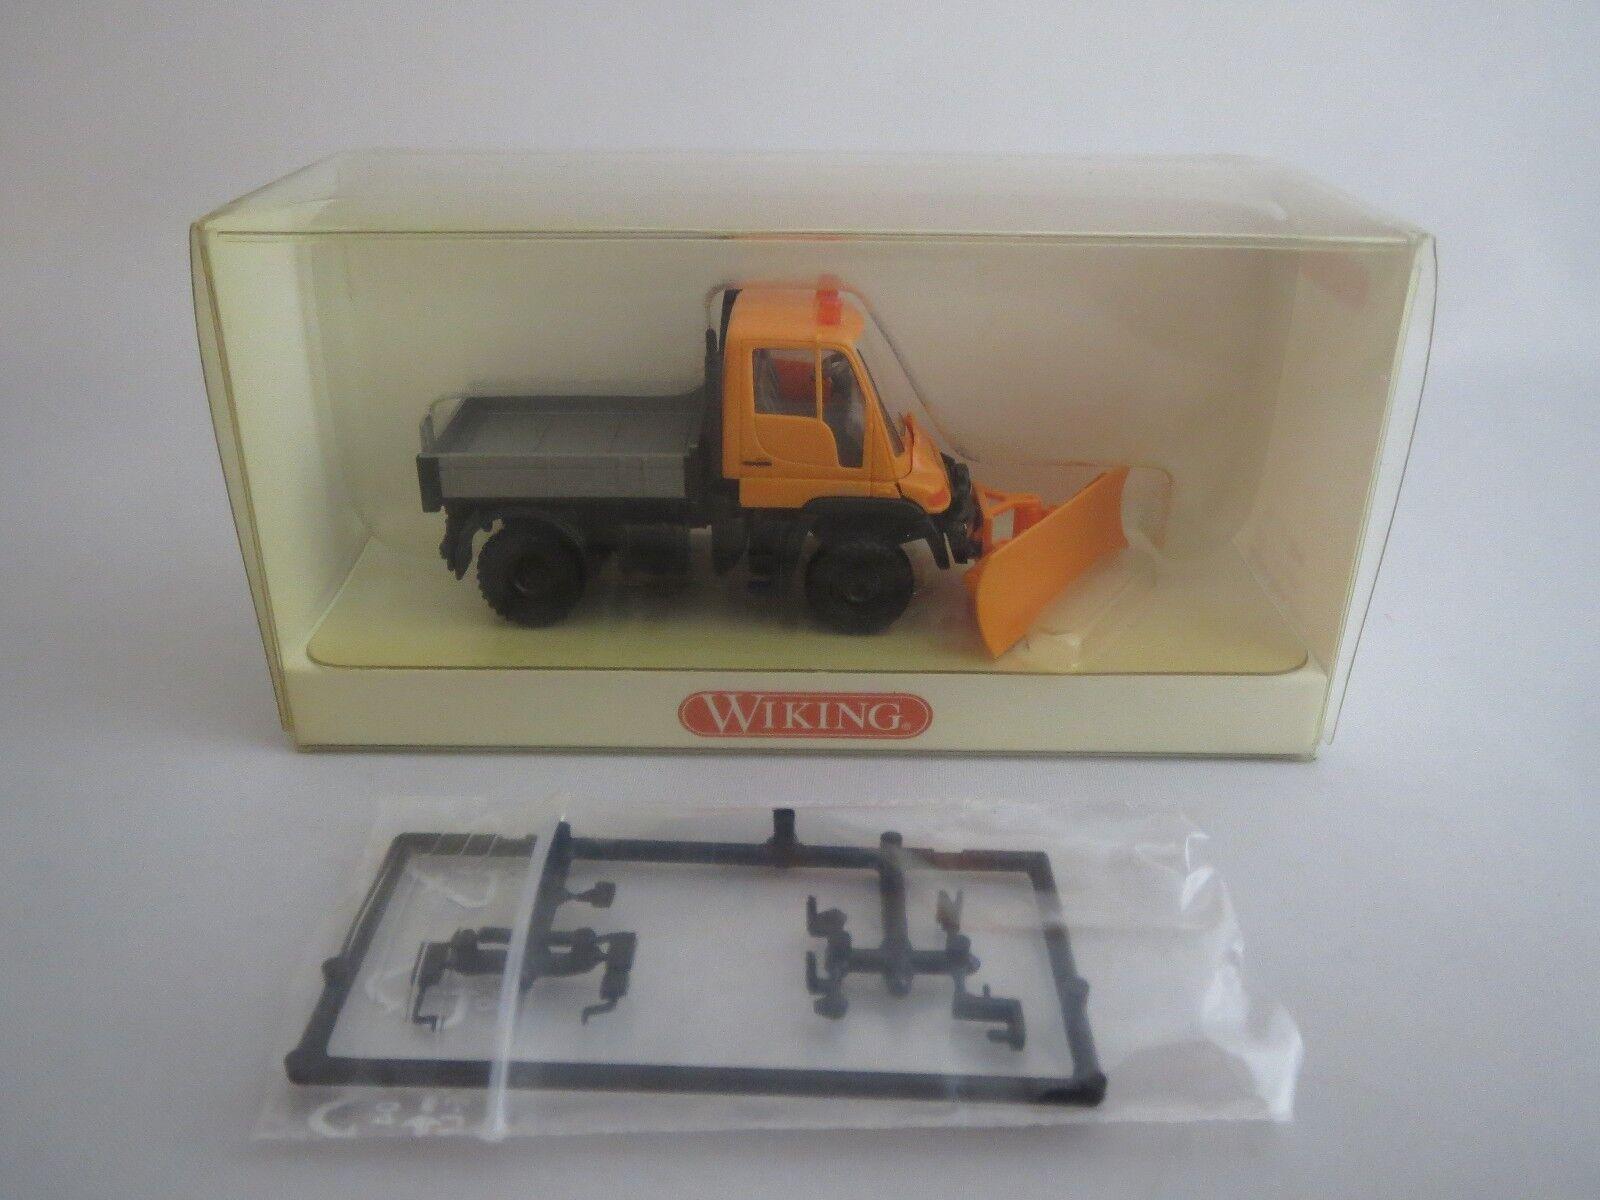 Wiking 6460335 Unimog U 400 avec chasse-neige neuf dans sa boîte